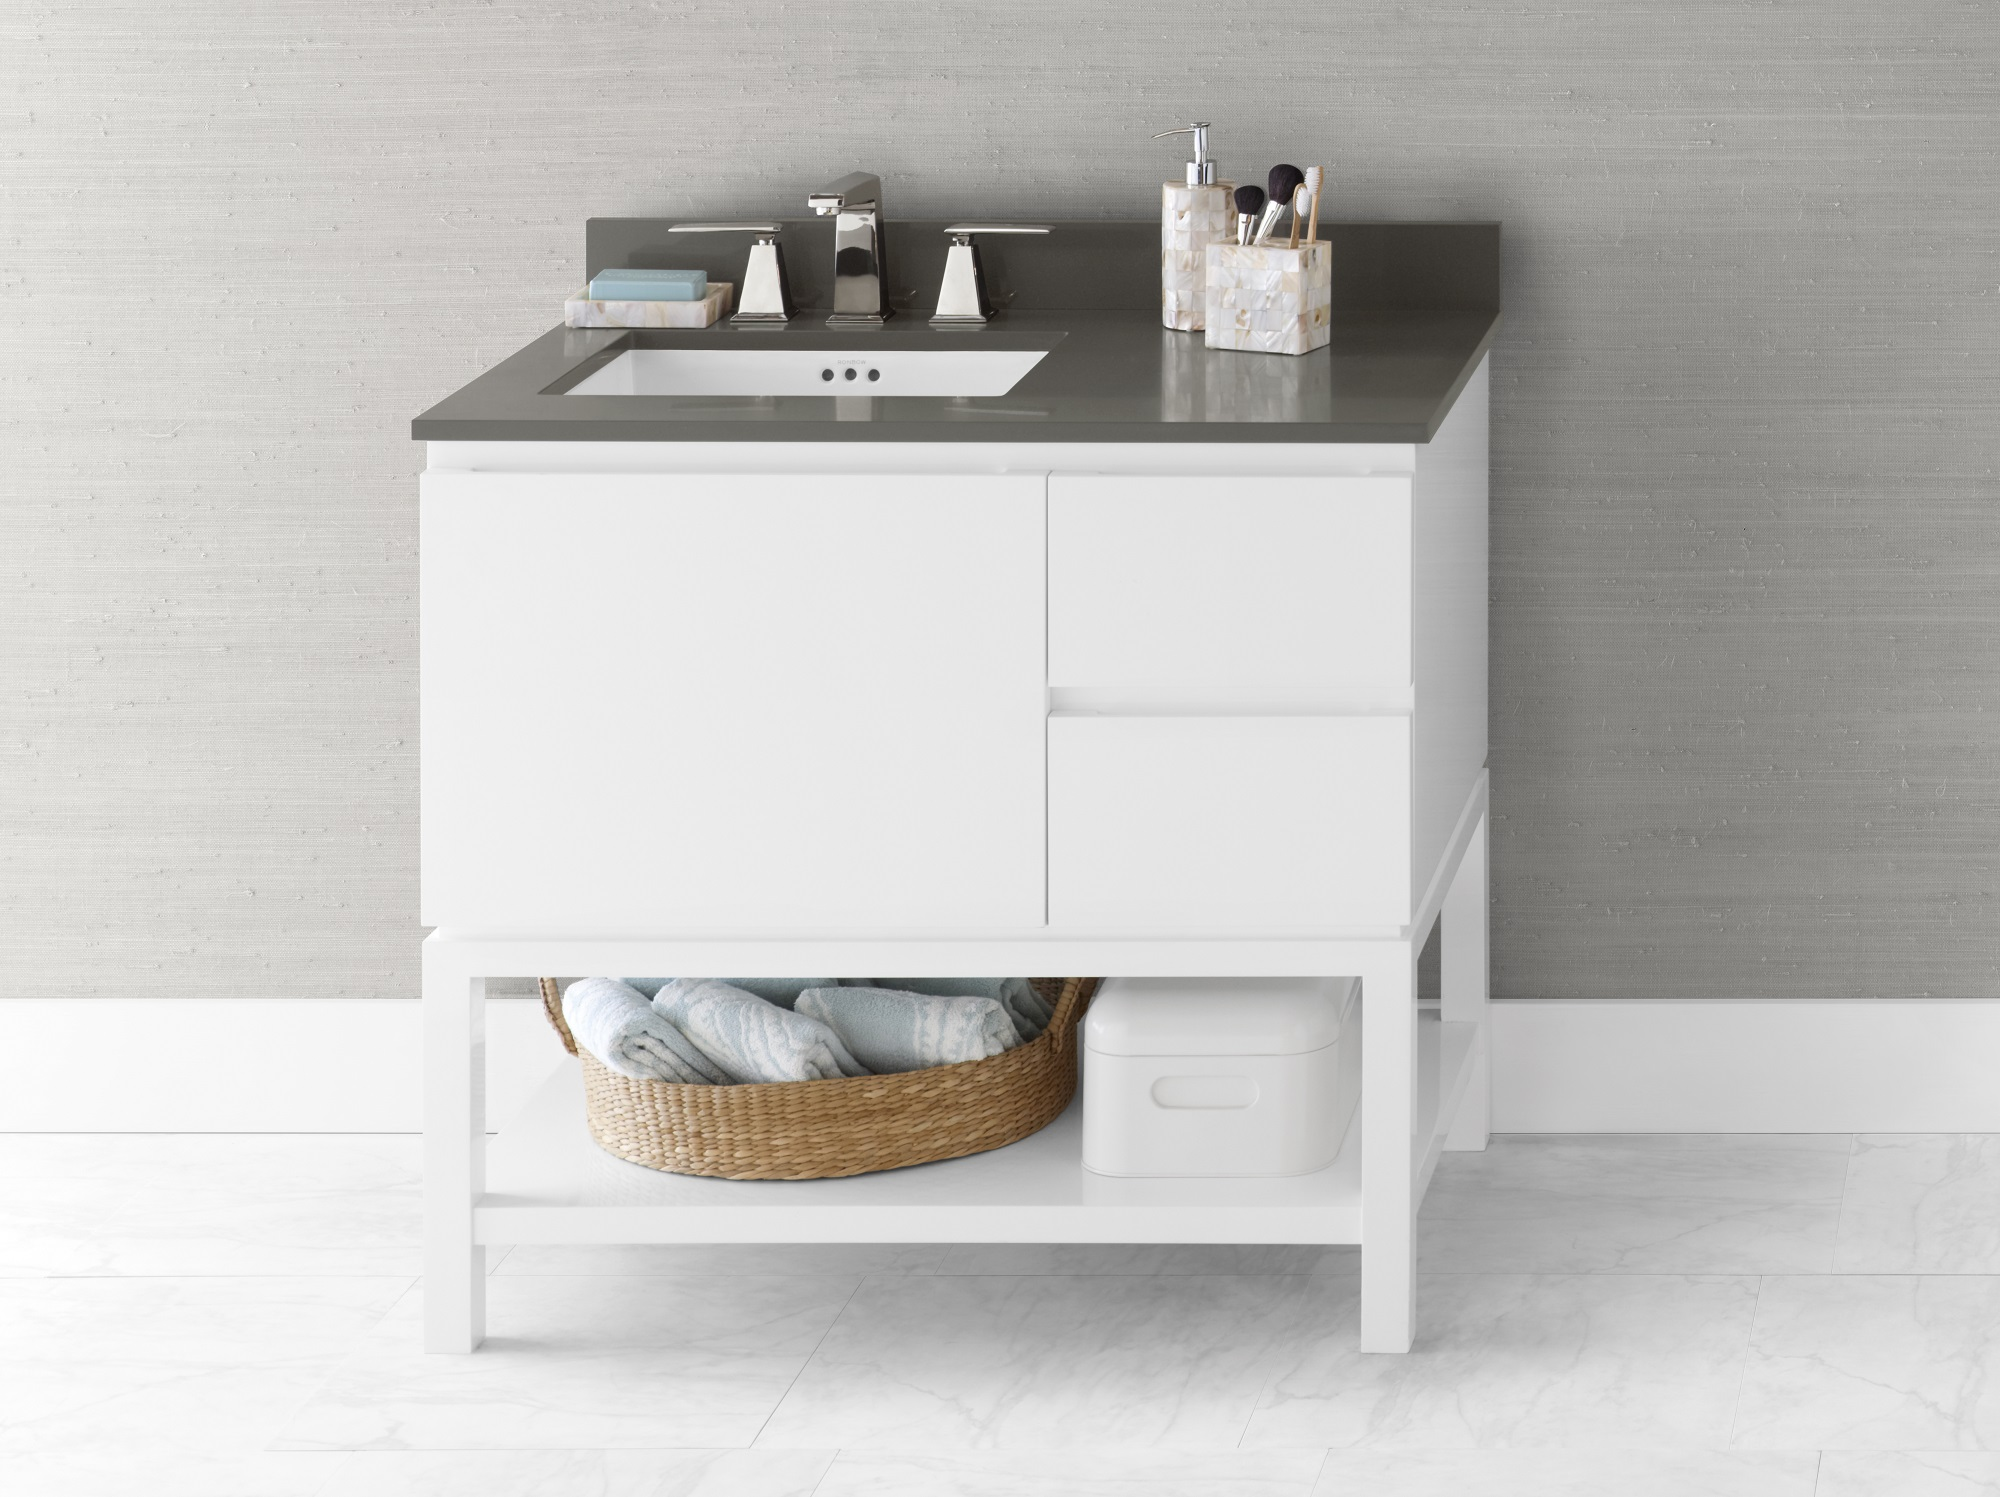 Ronbow 036036 L E23 Chloe 36 Bathroom Vanity Base Cabinet In Glossy White Large Drawer On Left 036036 L E23 Snyder Diamond